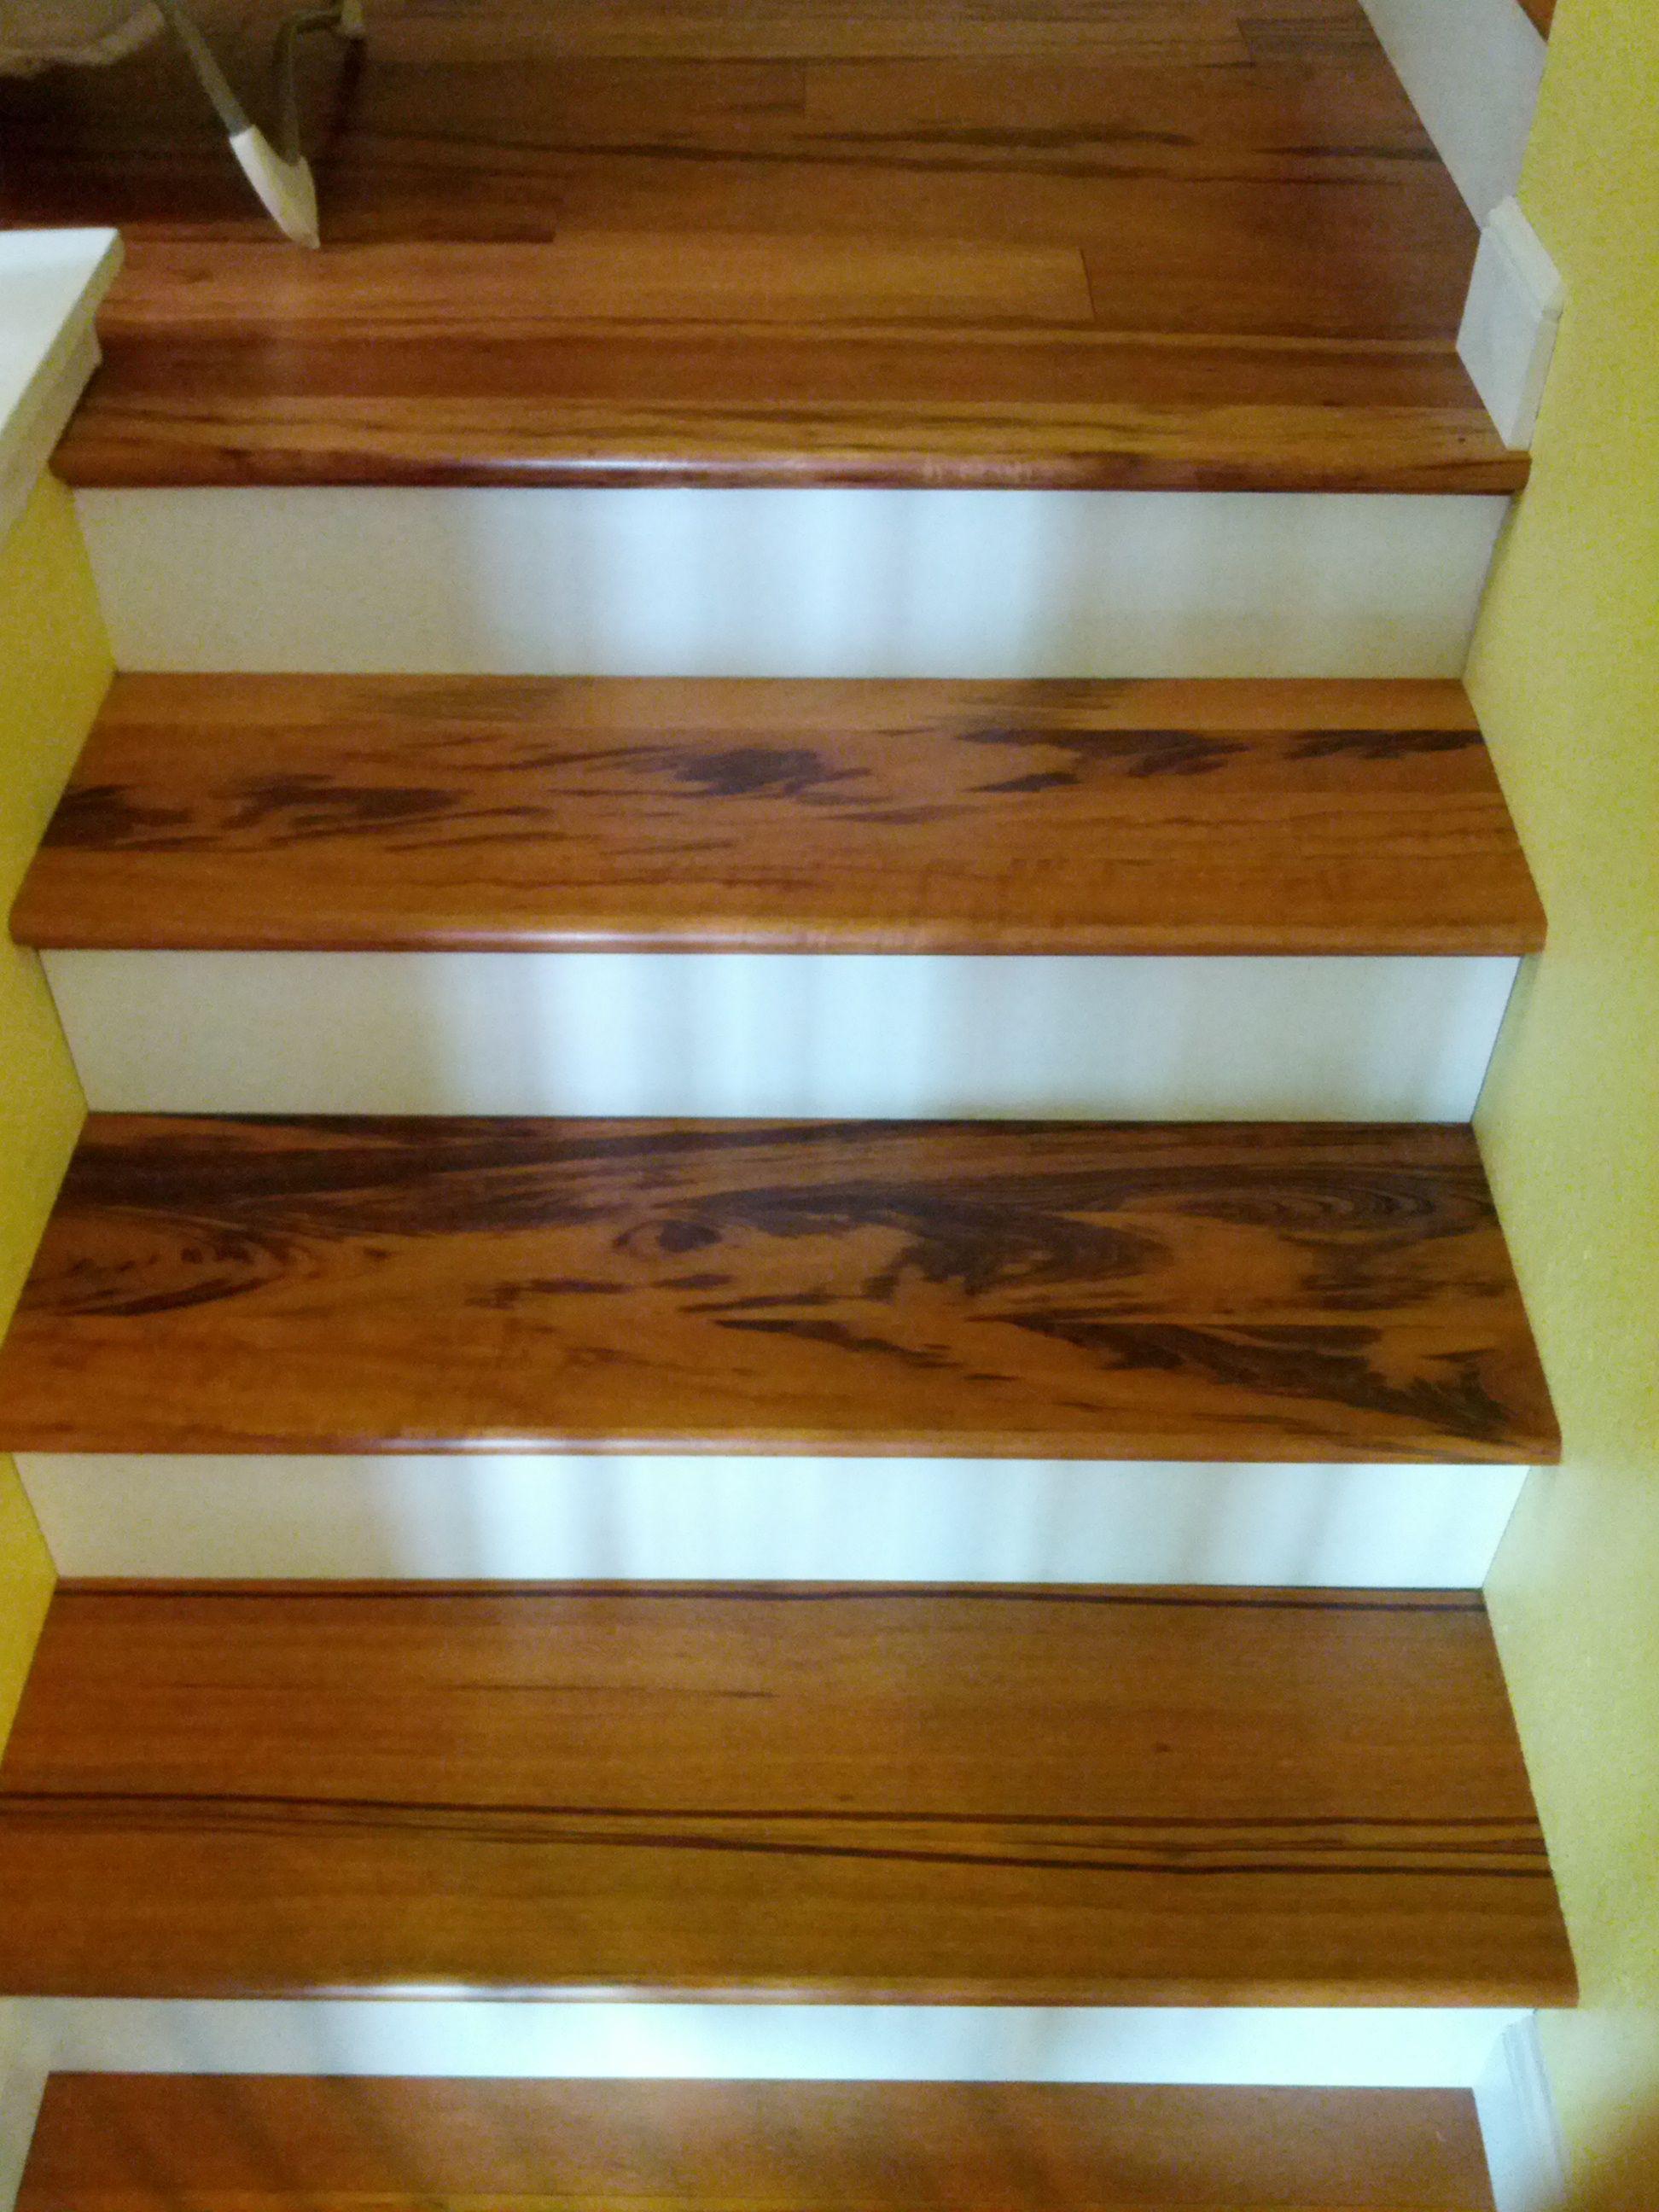 Superb Tigerwood Hardwood Stairs Installed By Precision Flooring. Visit  Http://www.prefloors